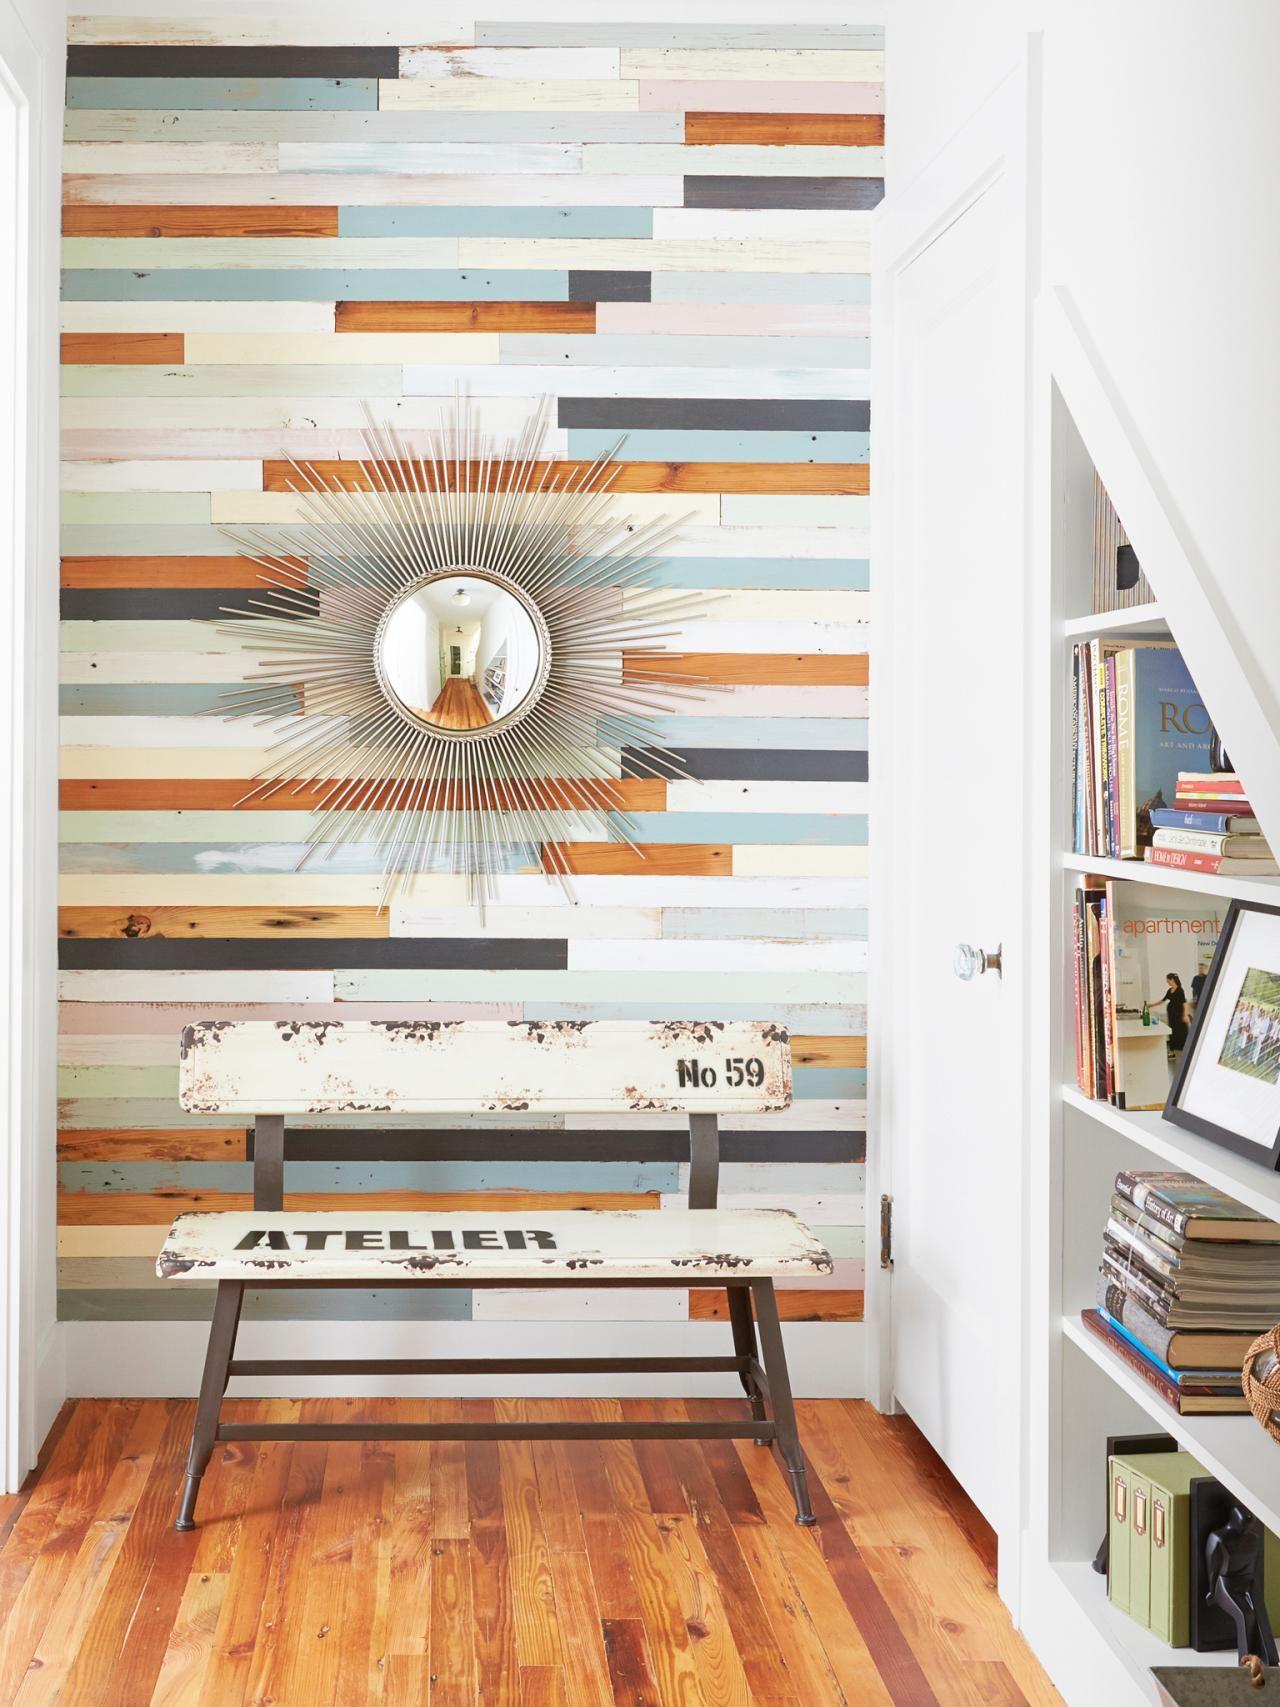 Apartment renovation interior design tips from professionals